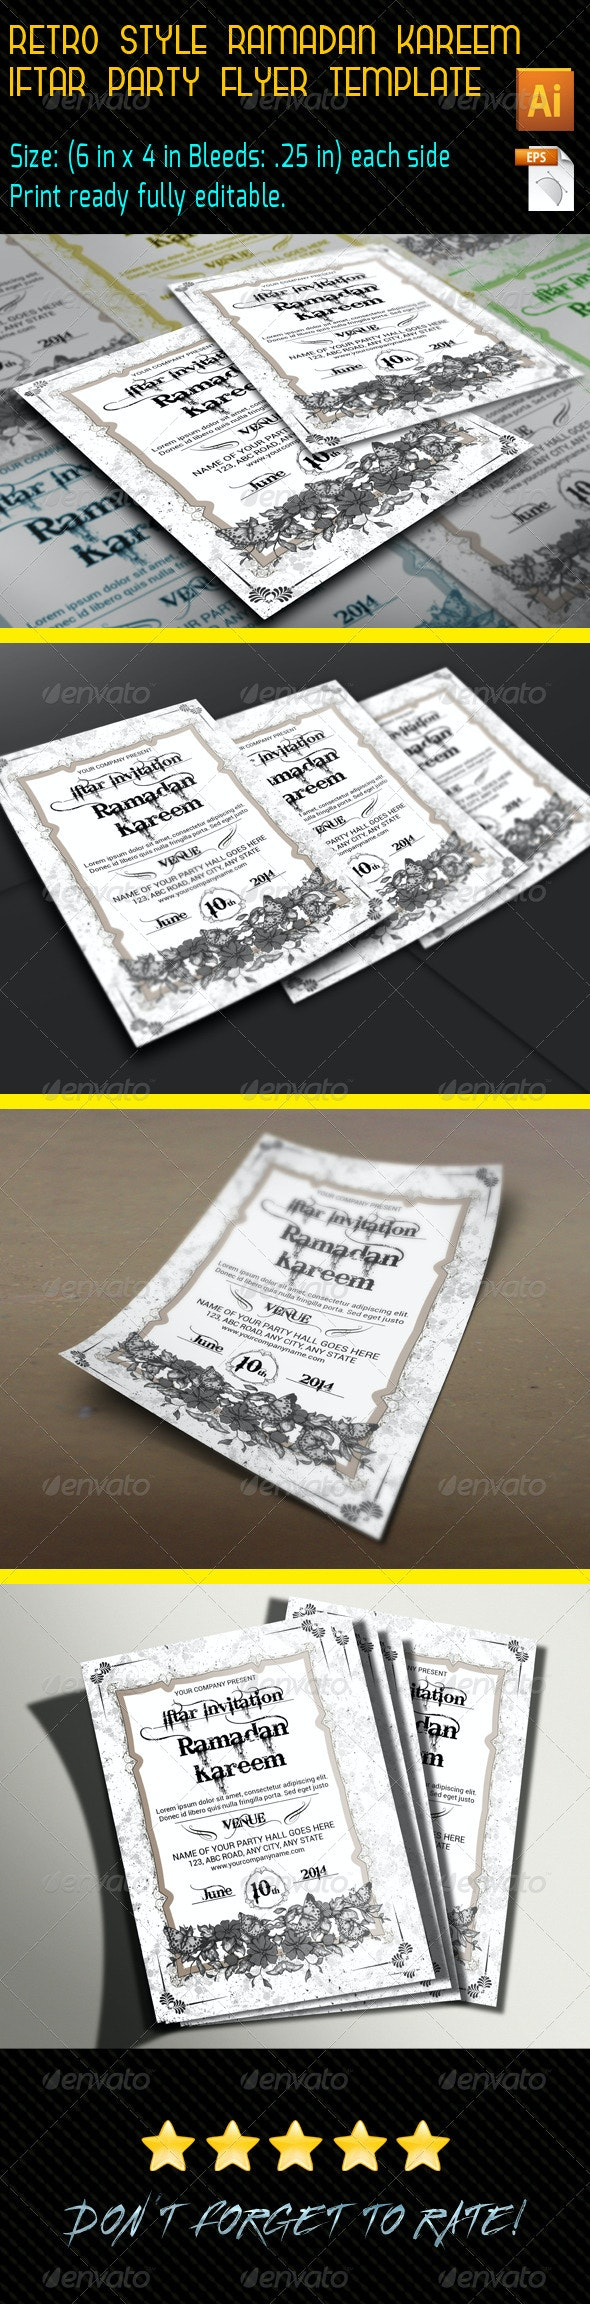 Retro Style Ramadan Kareem Flyer Template - Invitations Cards & Invites